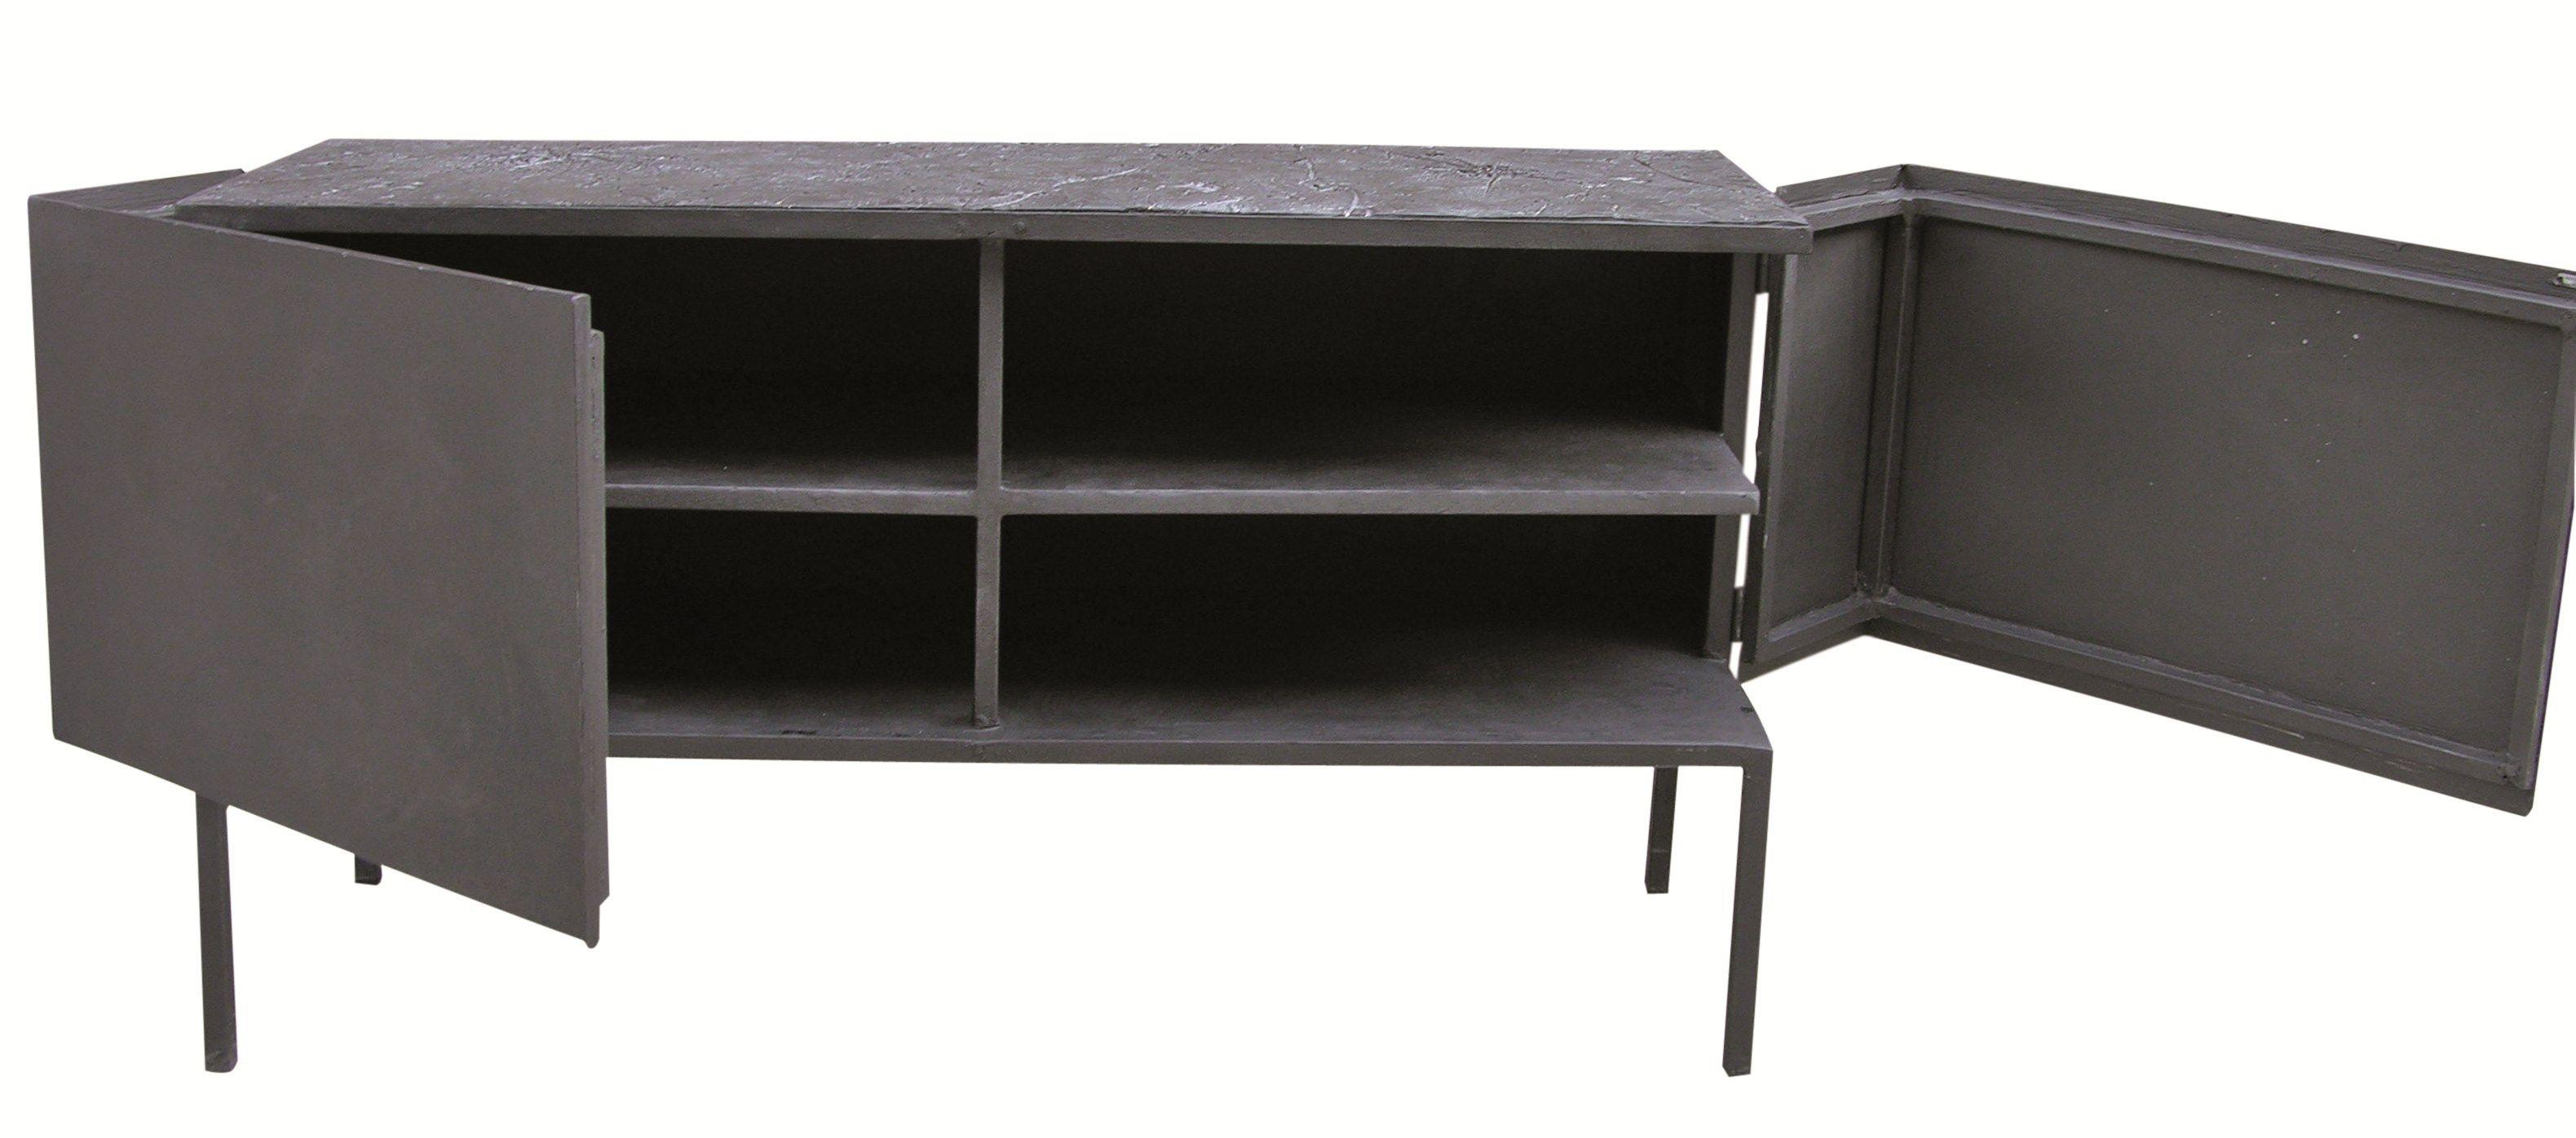 empreintes huellas buffet by ici et l design josep cerda. Black Bedroom Furniture Sets. Home Design Ideas